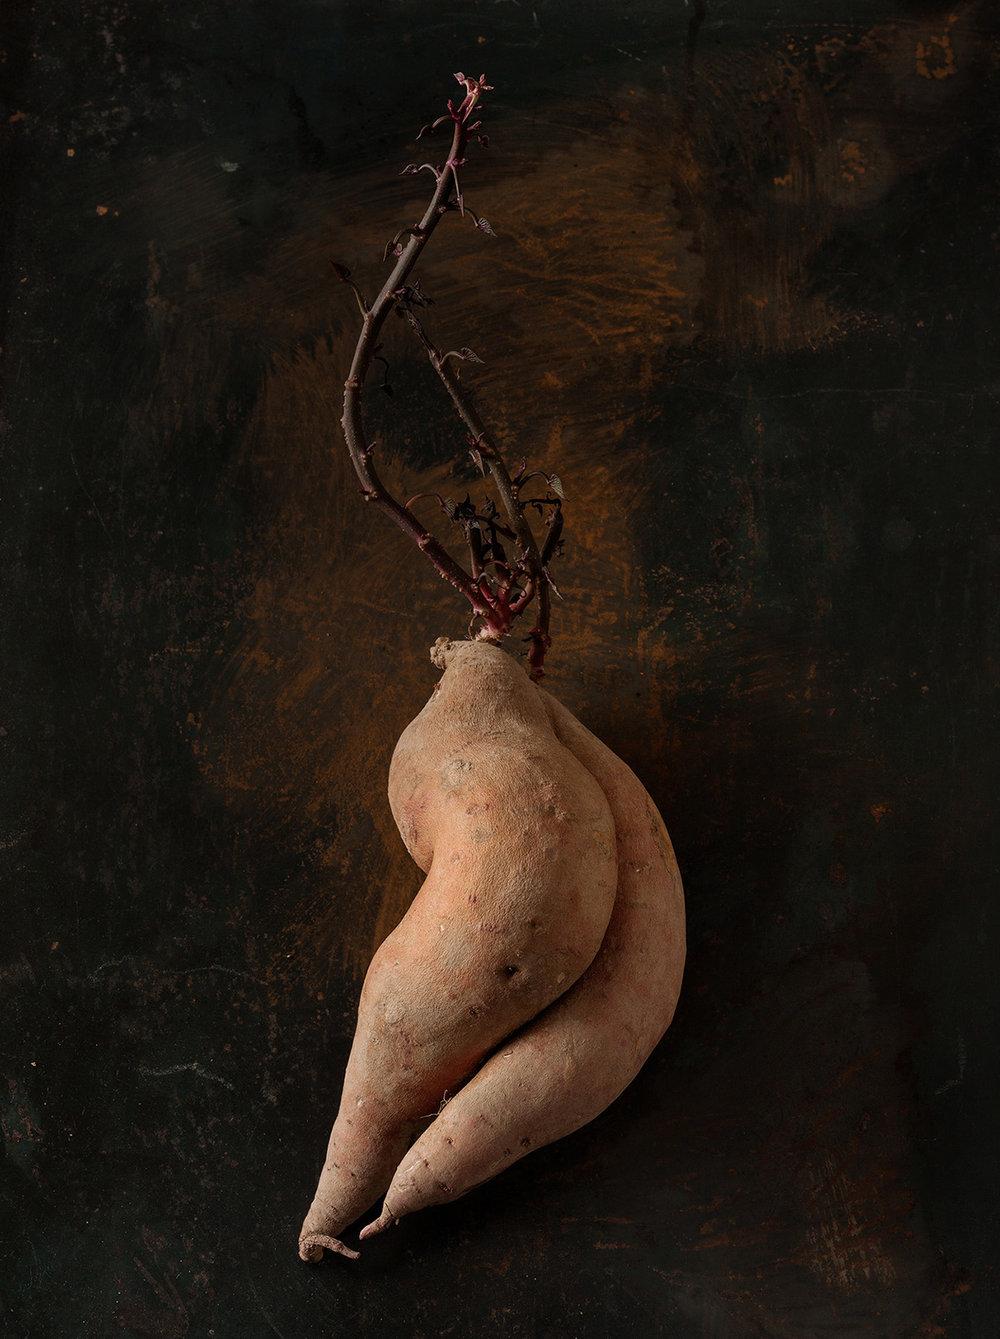 52_Beth_Galton_Amour_de_Pomme_de_Terre_Garnet_Sweet_Potato_15days-a_3.jpg